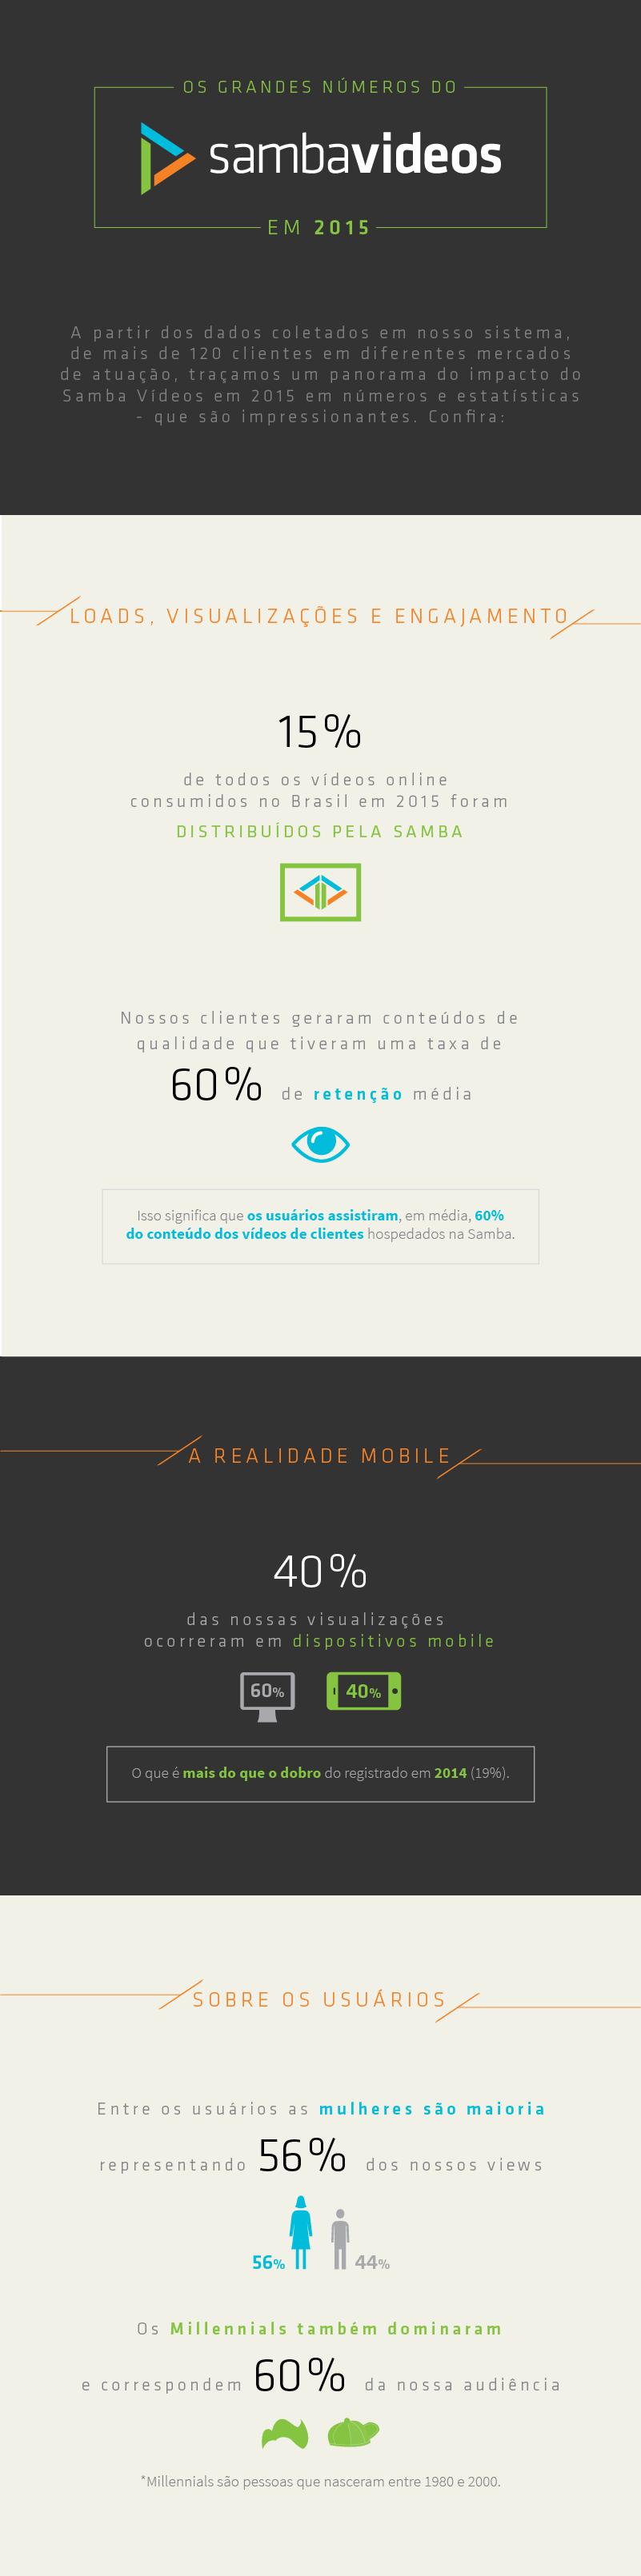 [Infografico] Samba Videos 2015-07